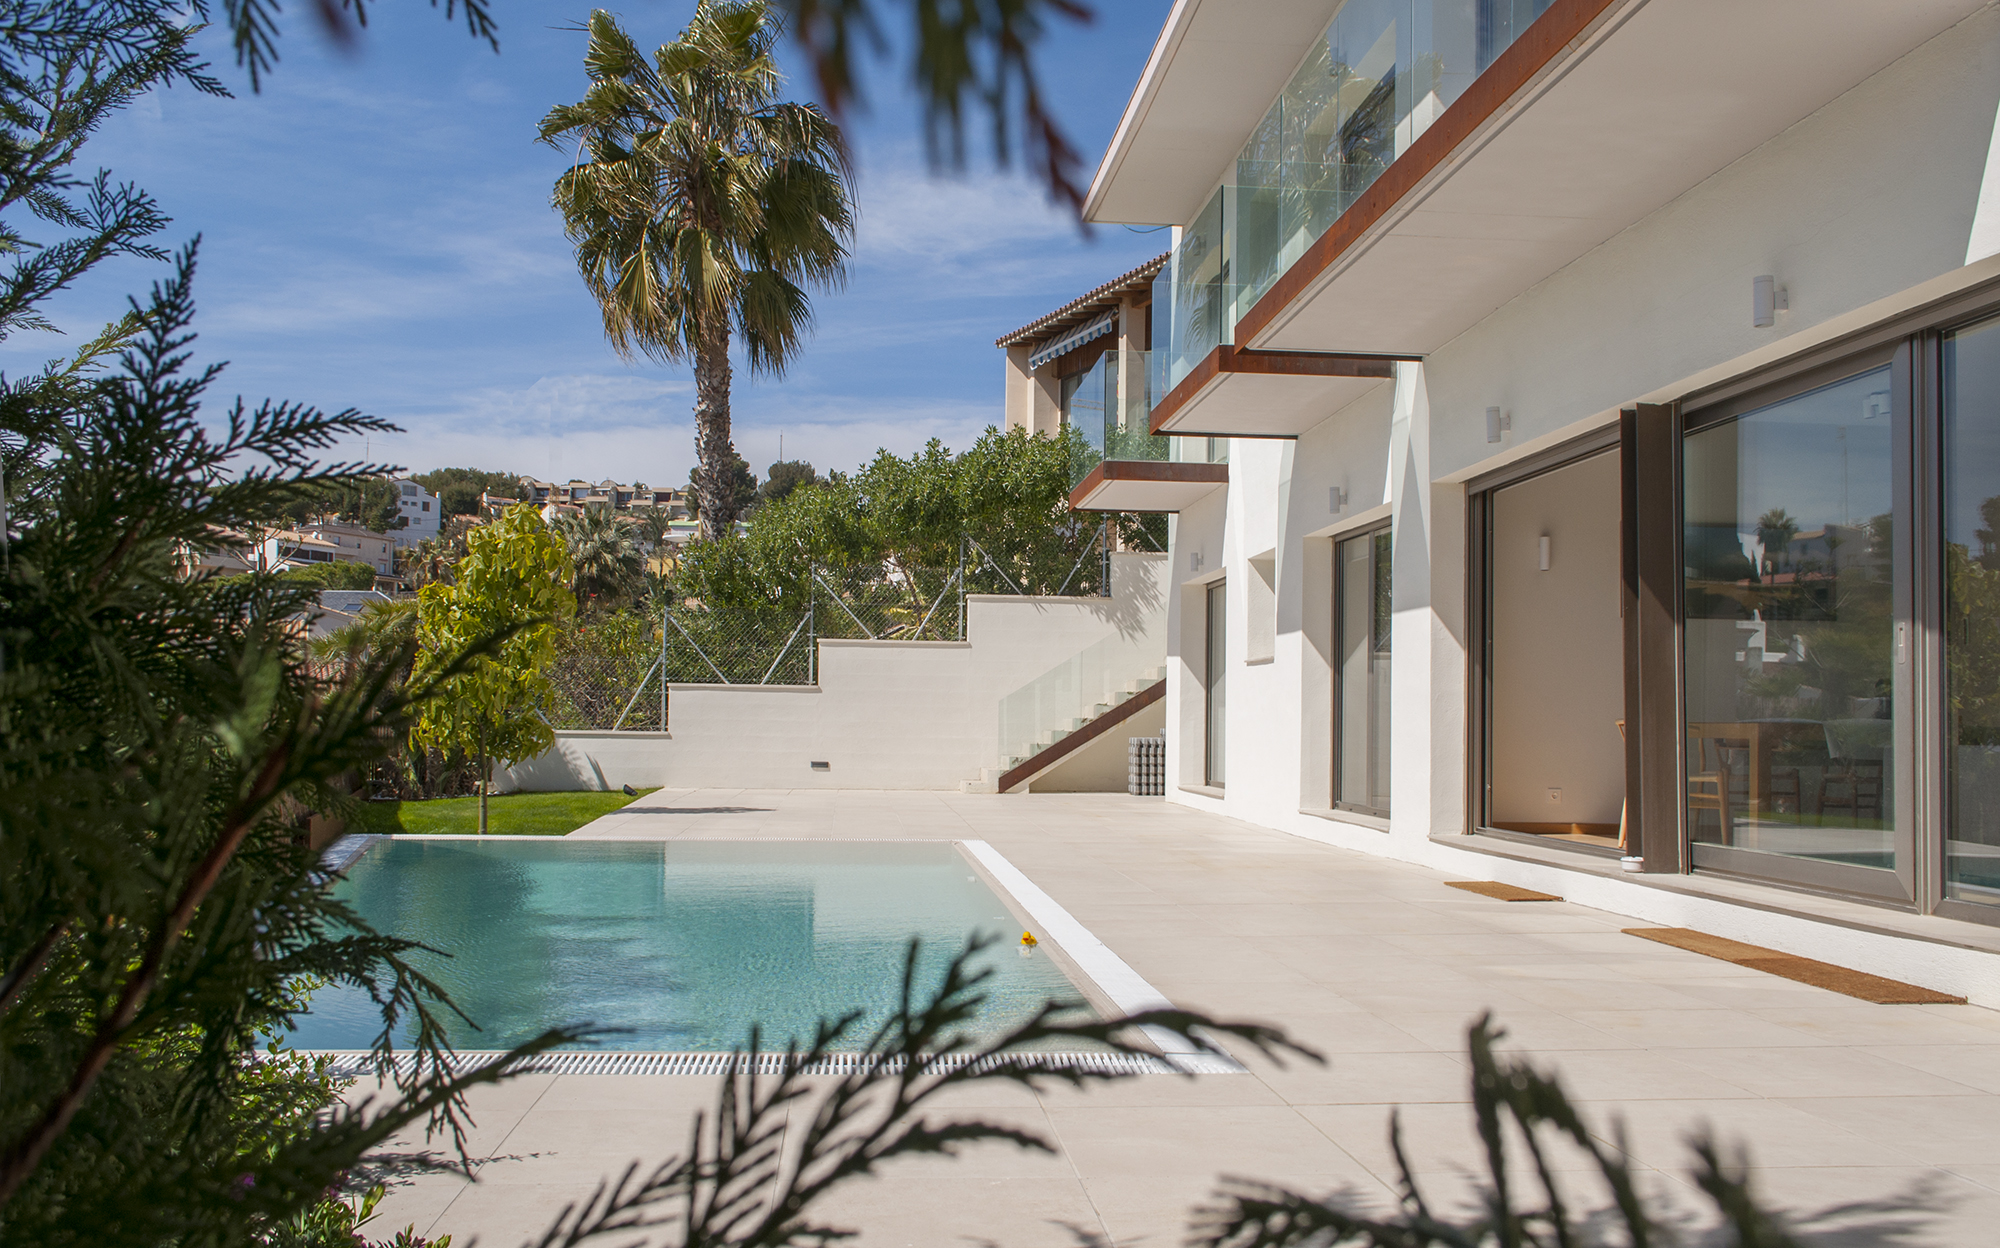 26-rardo-architects-casas-en-sitges-jardin-con-piscina